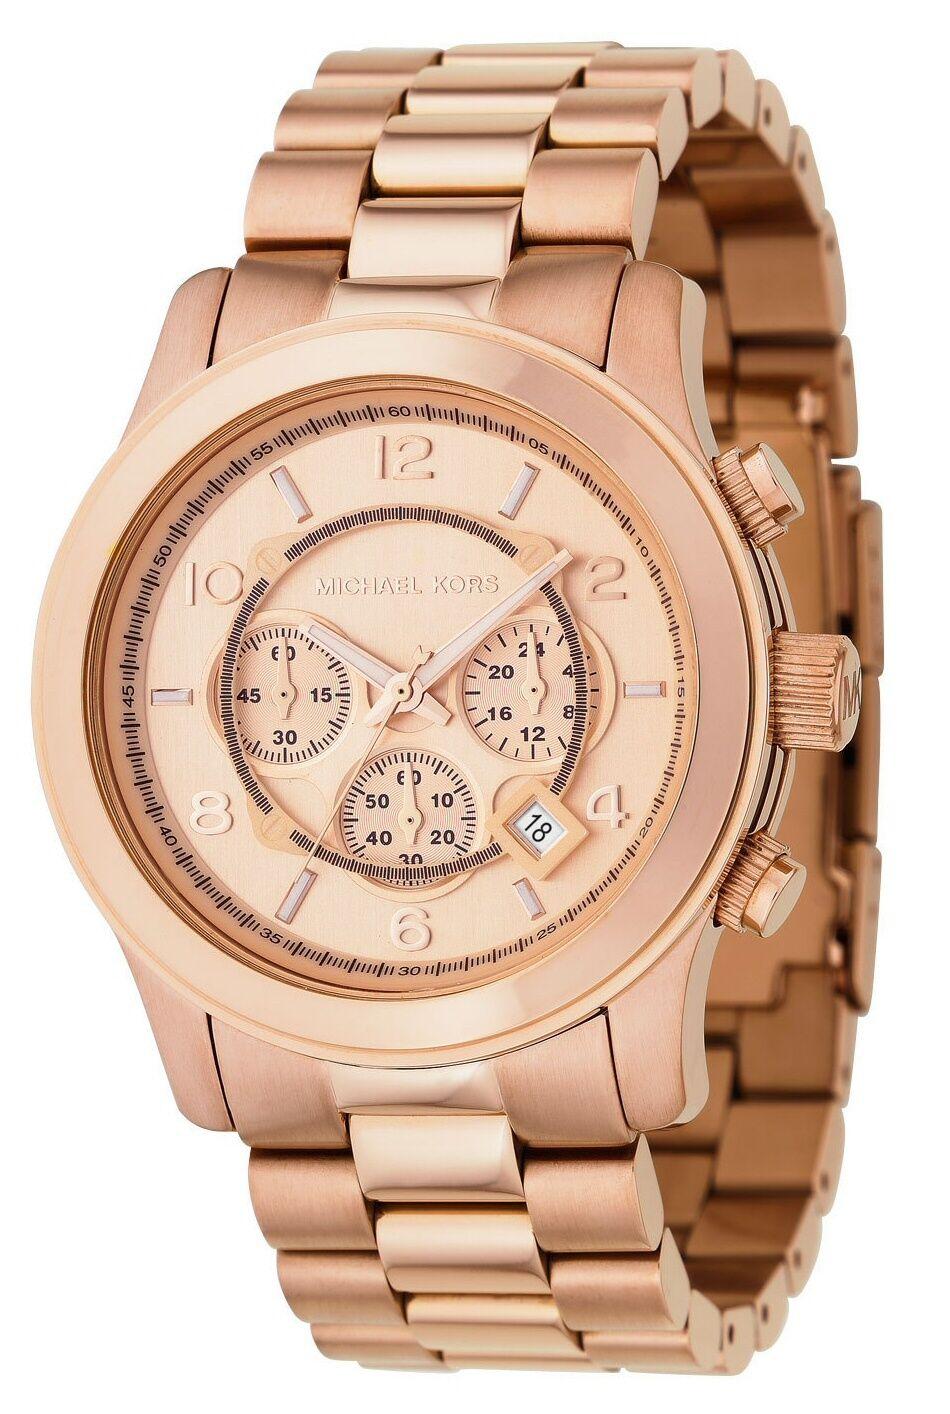 New Michael Kors, MK8096 Men's Runway Rose Gold Stainless Steel Bracelet Watch